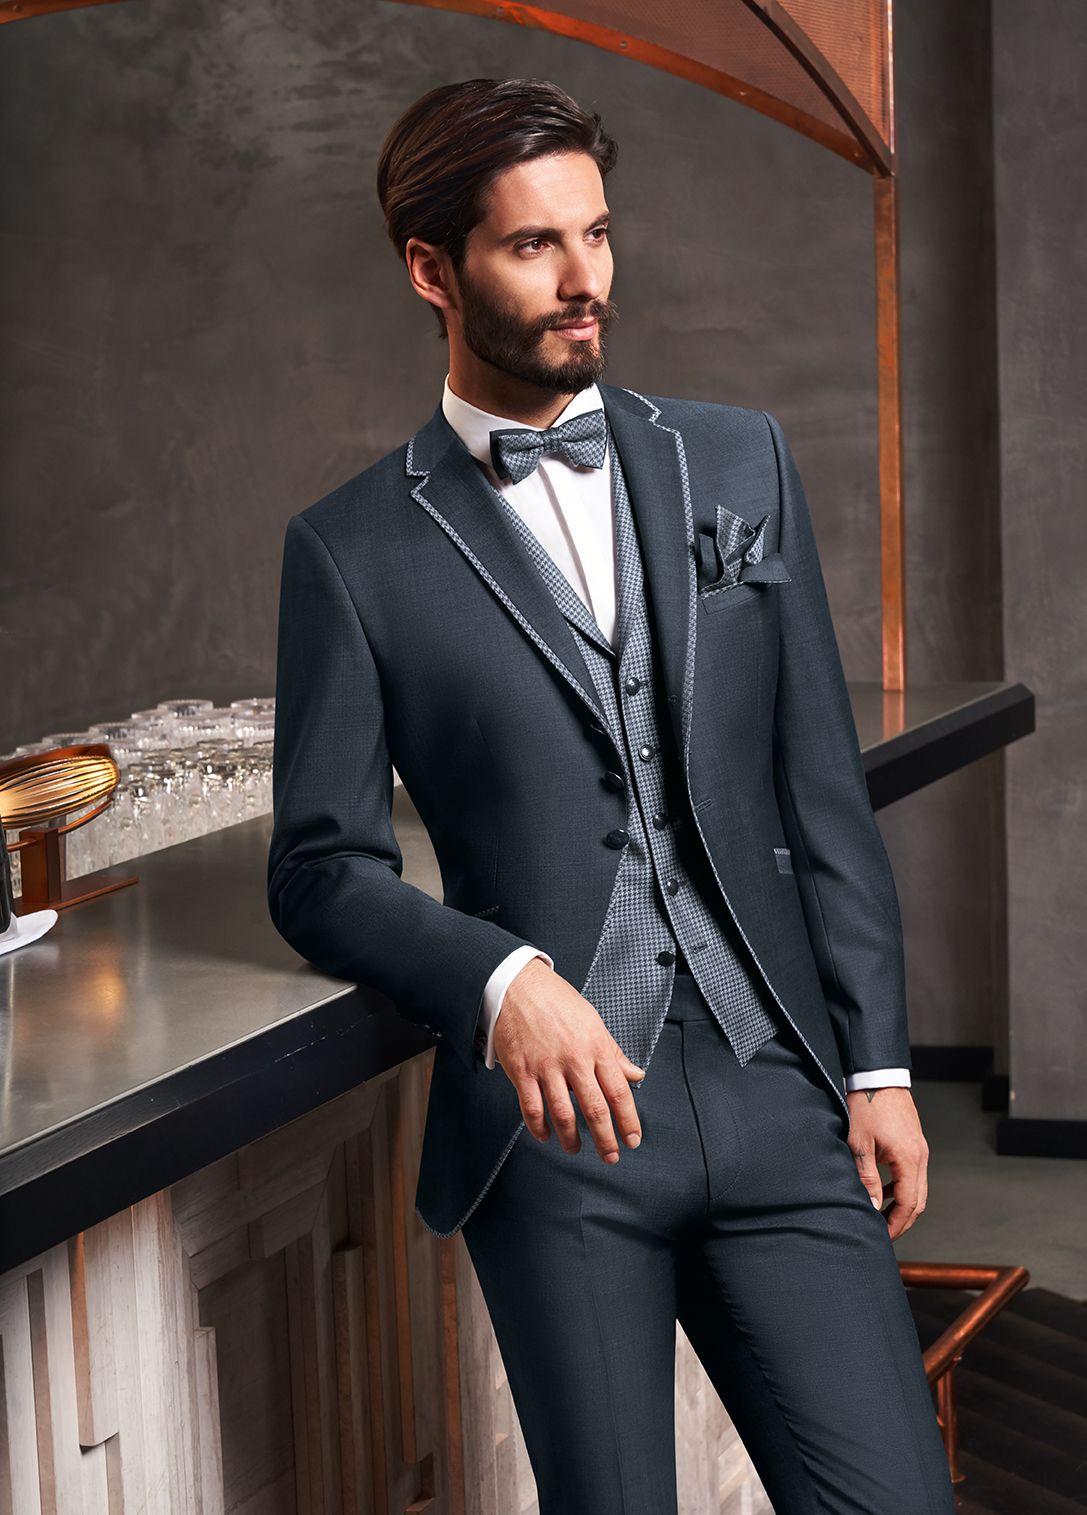 Hochzeitsanzug Prestige 2020 Look 5 Mann Anzug Hochzeit Anzug Hochzeit Hochzeitsanzug Brautigam